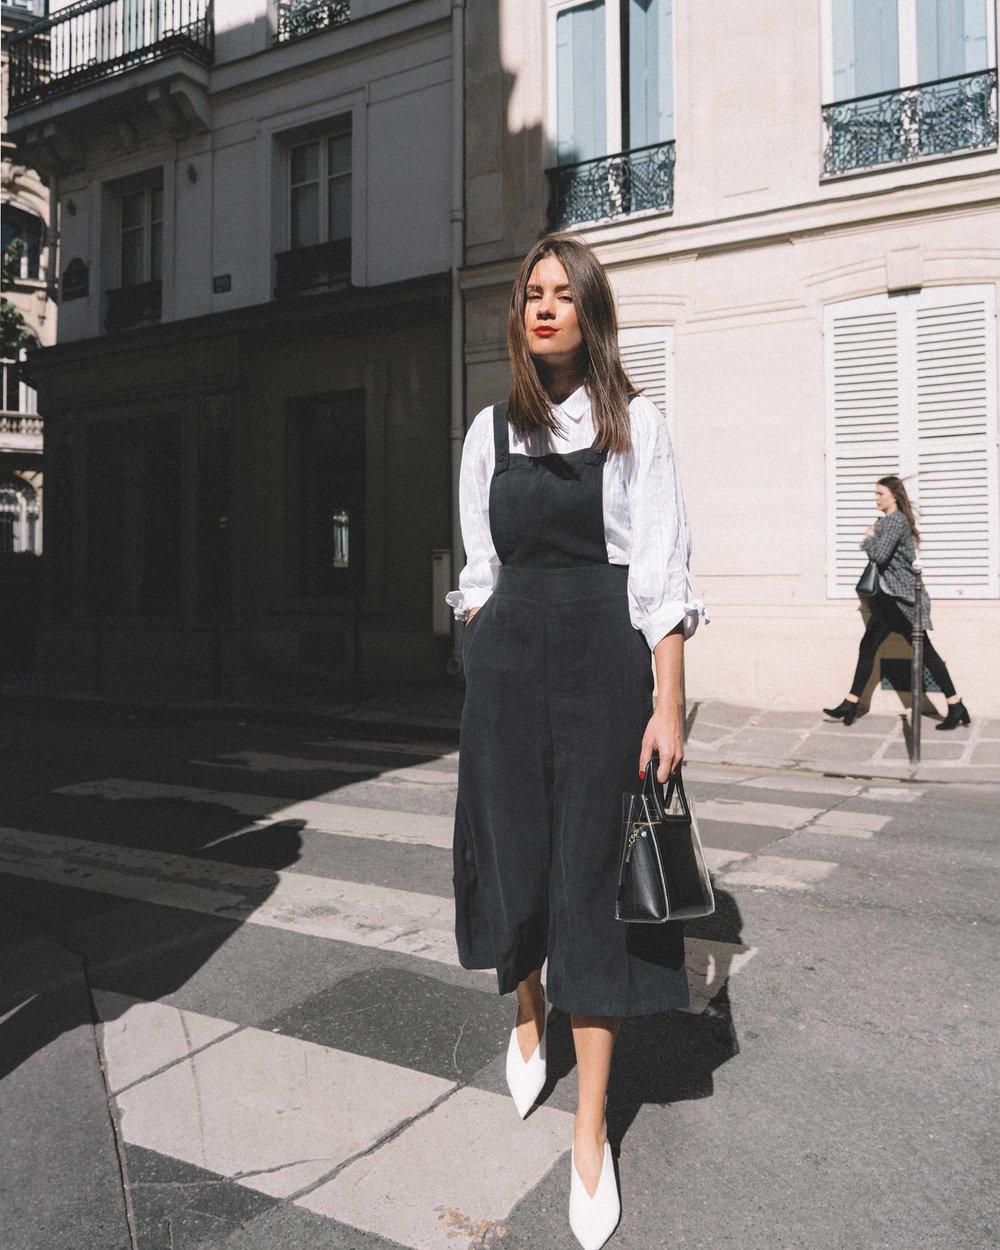 Black Culotte Overall Jumpsuit Paris Outfit2.jpg